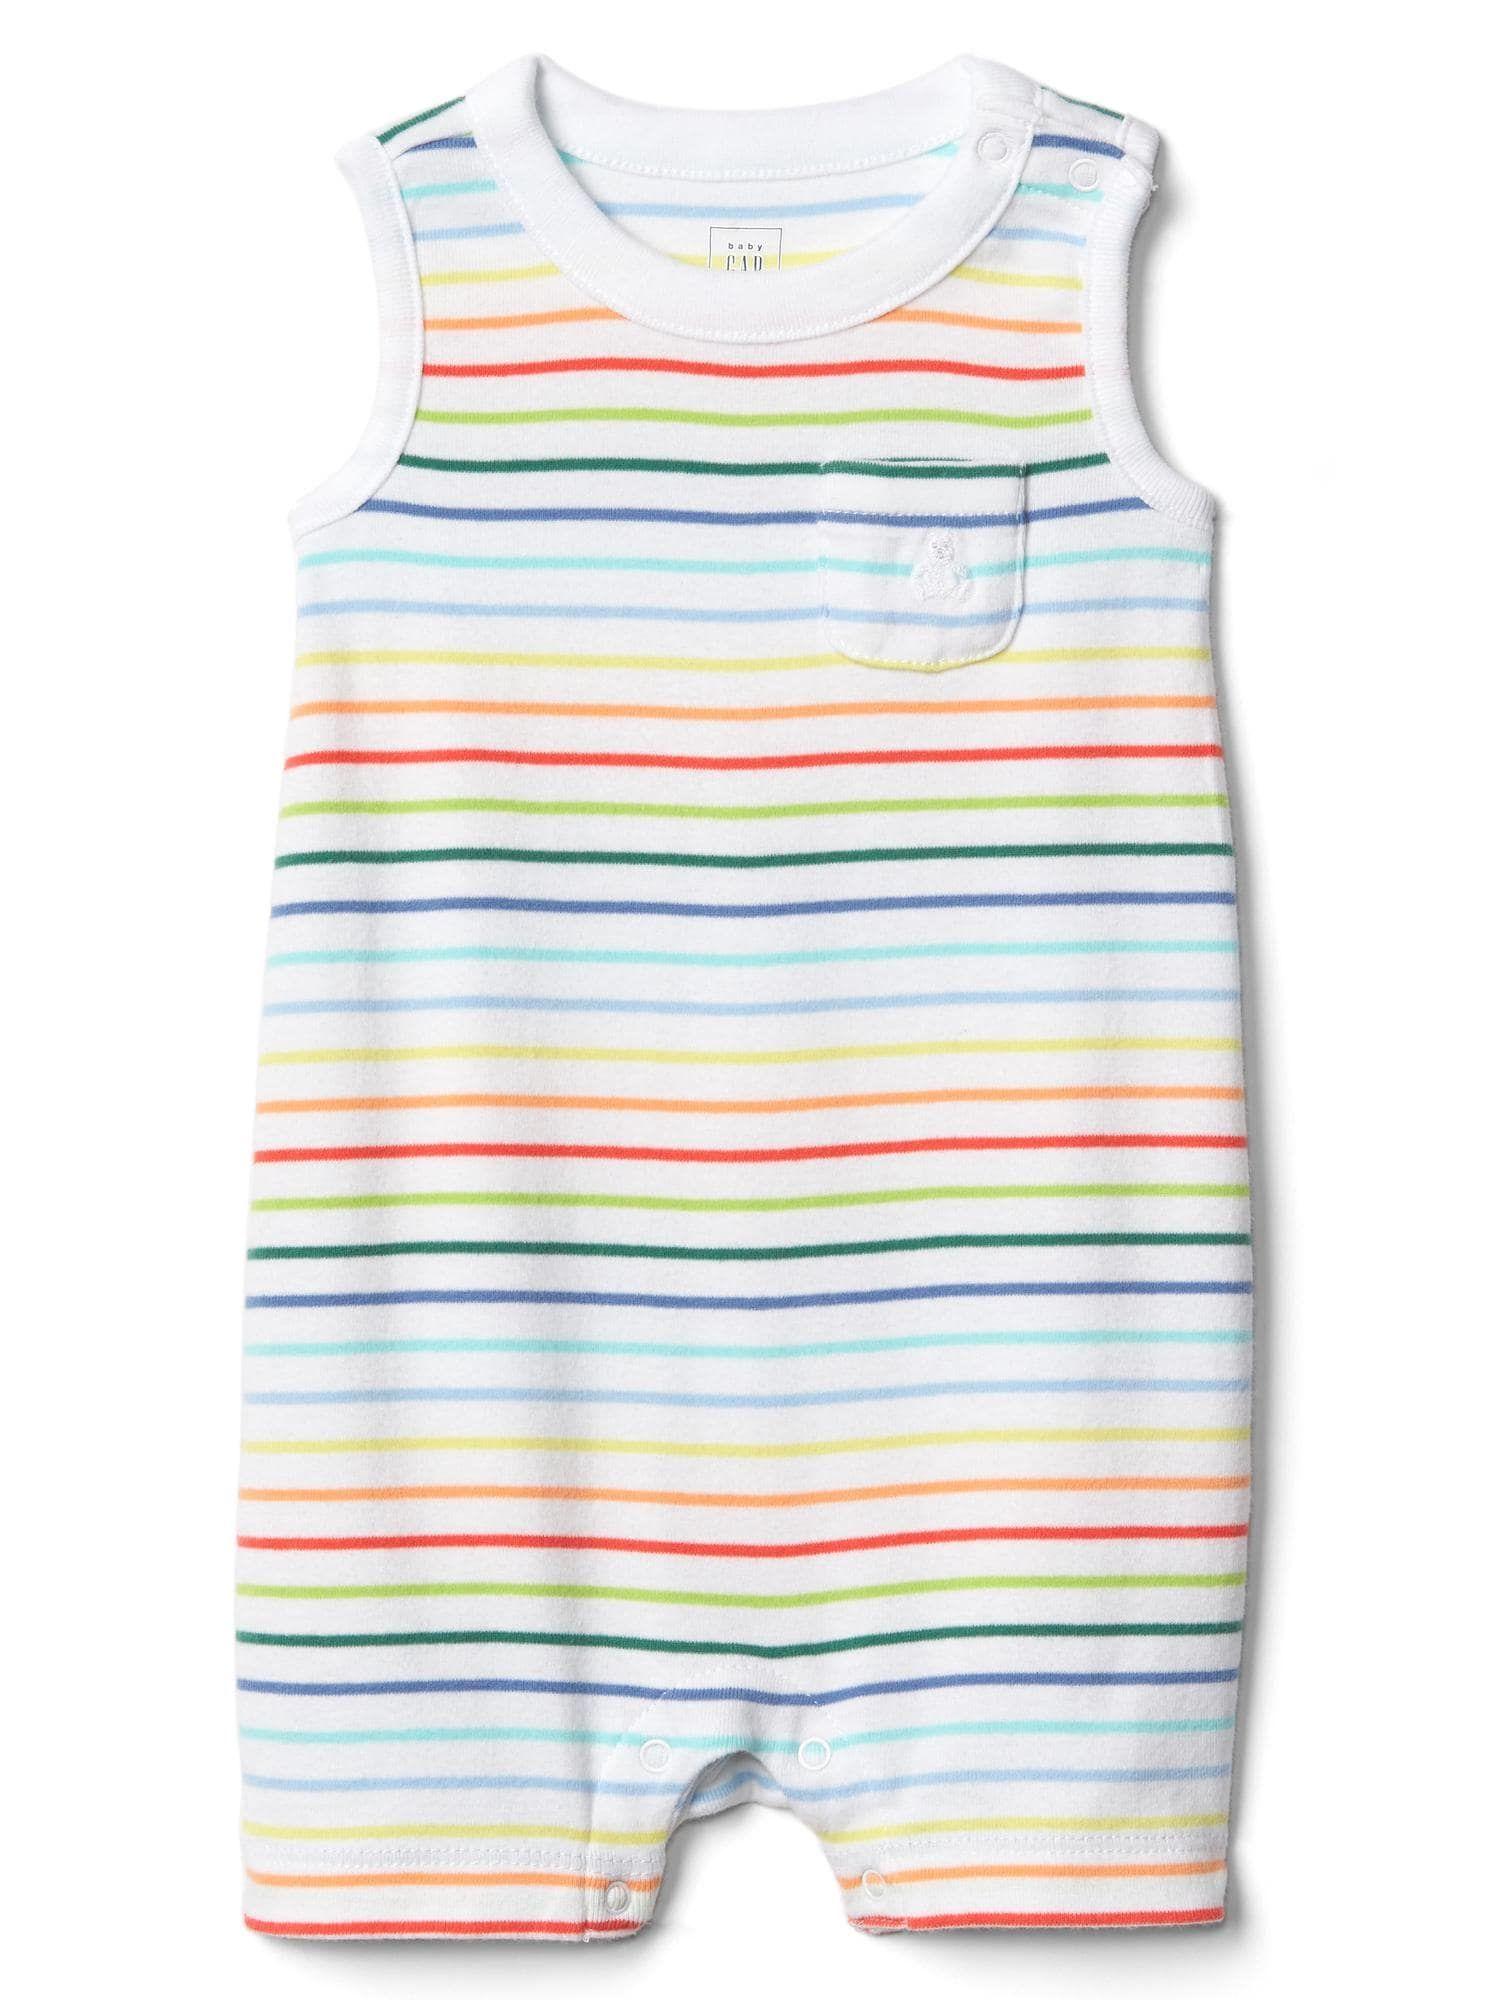 Baby Gap Boys 12-18 Months Outfit Gap Logo Striped Shirt /& Cargo Shorts Nwt